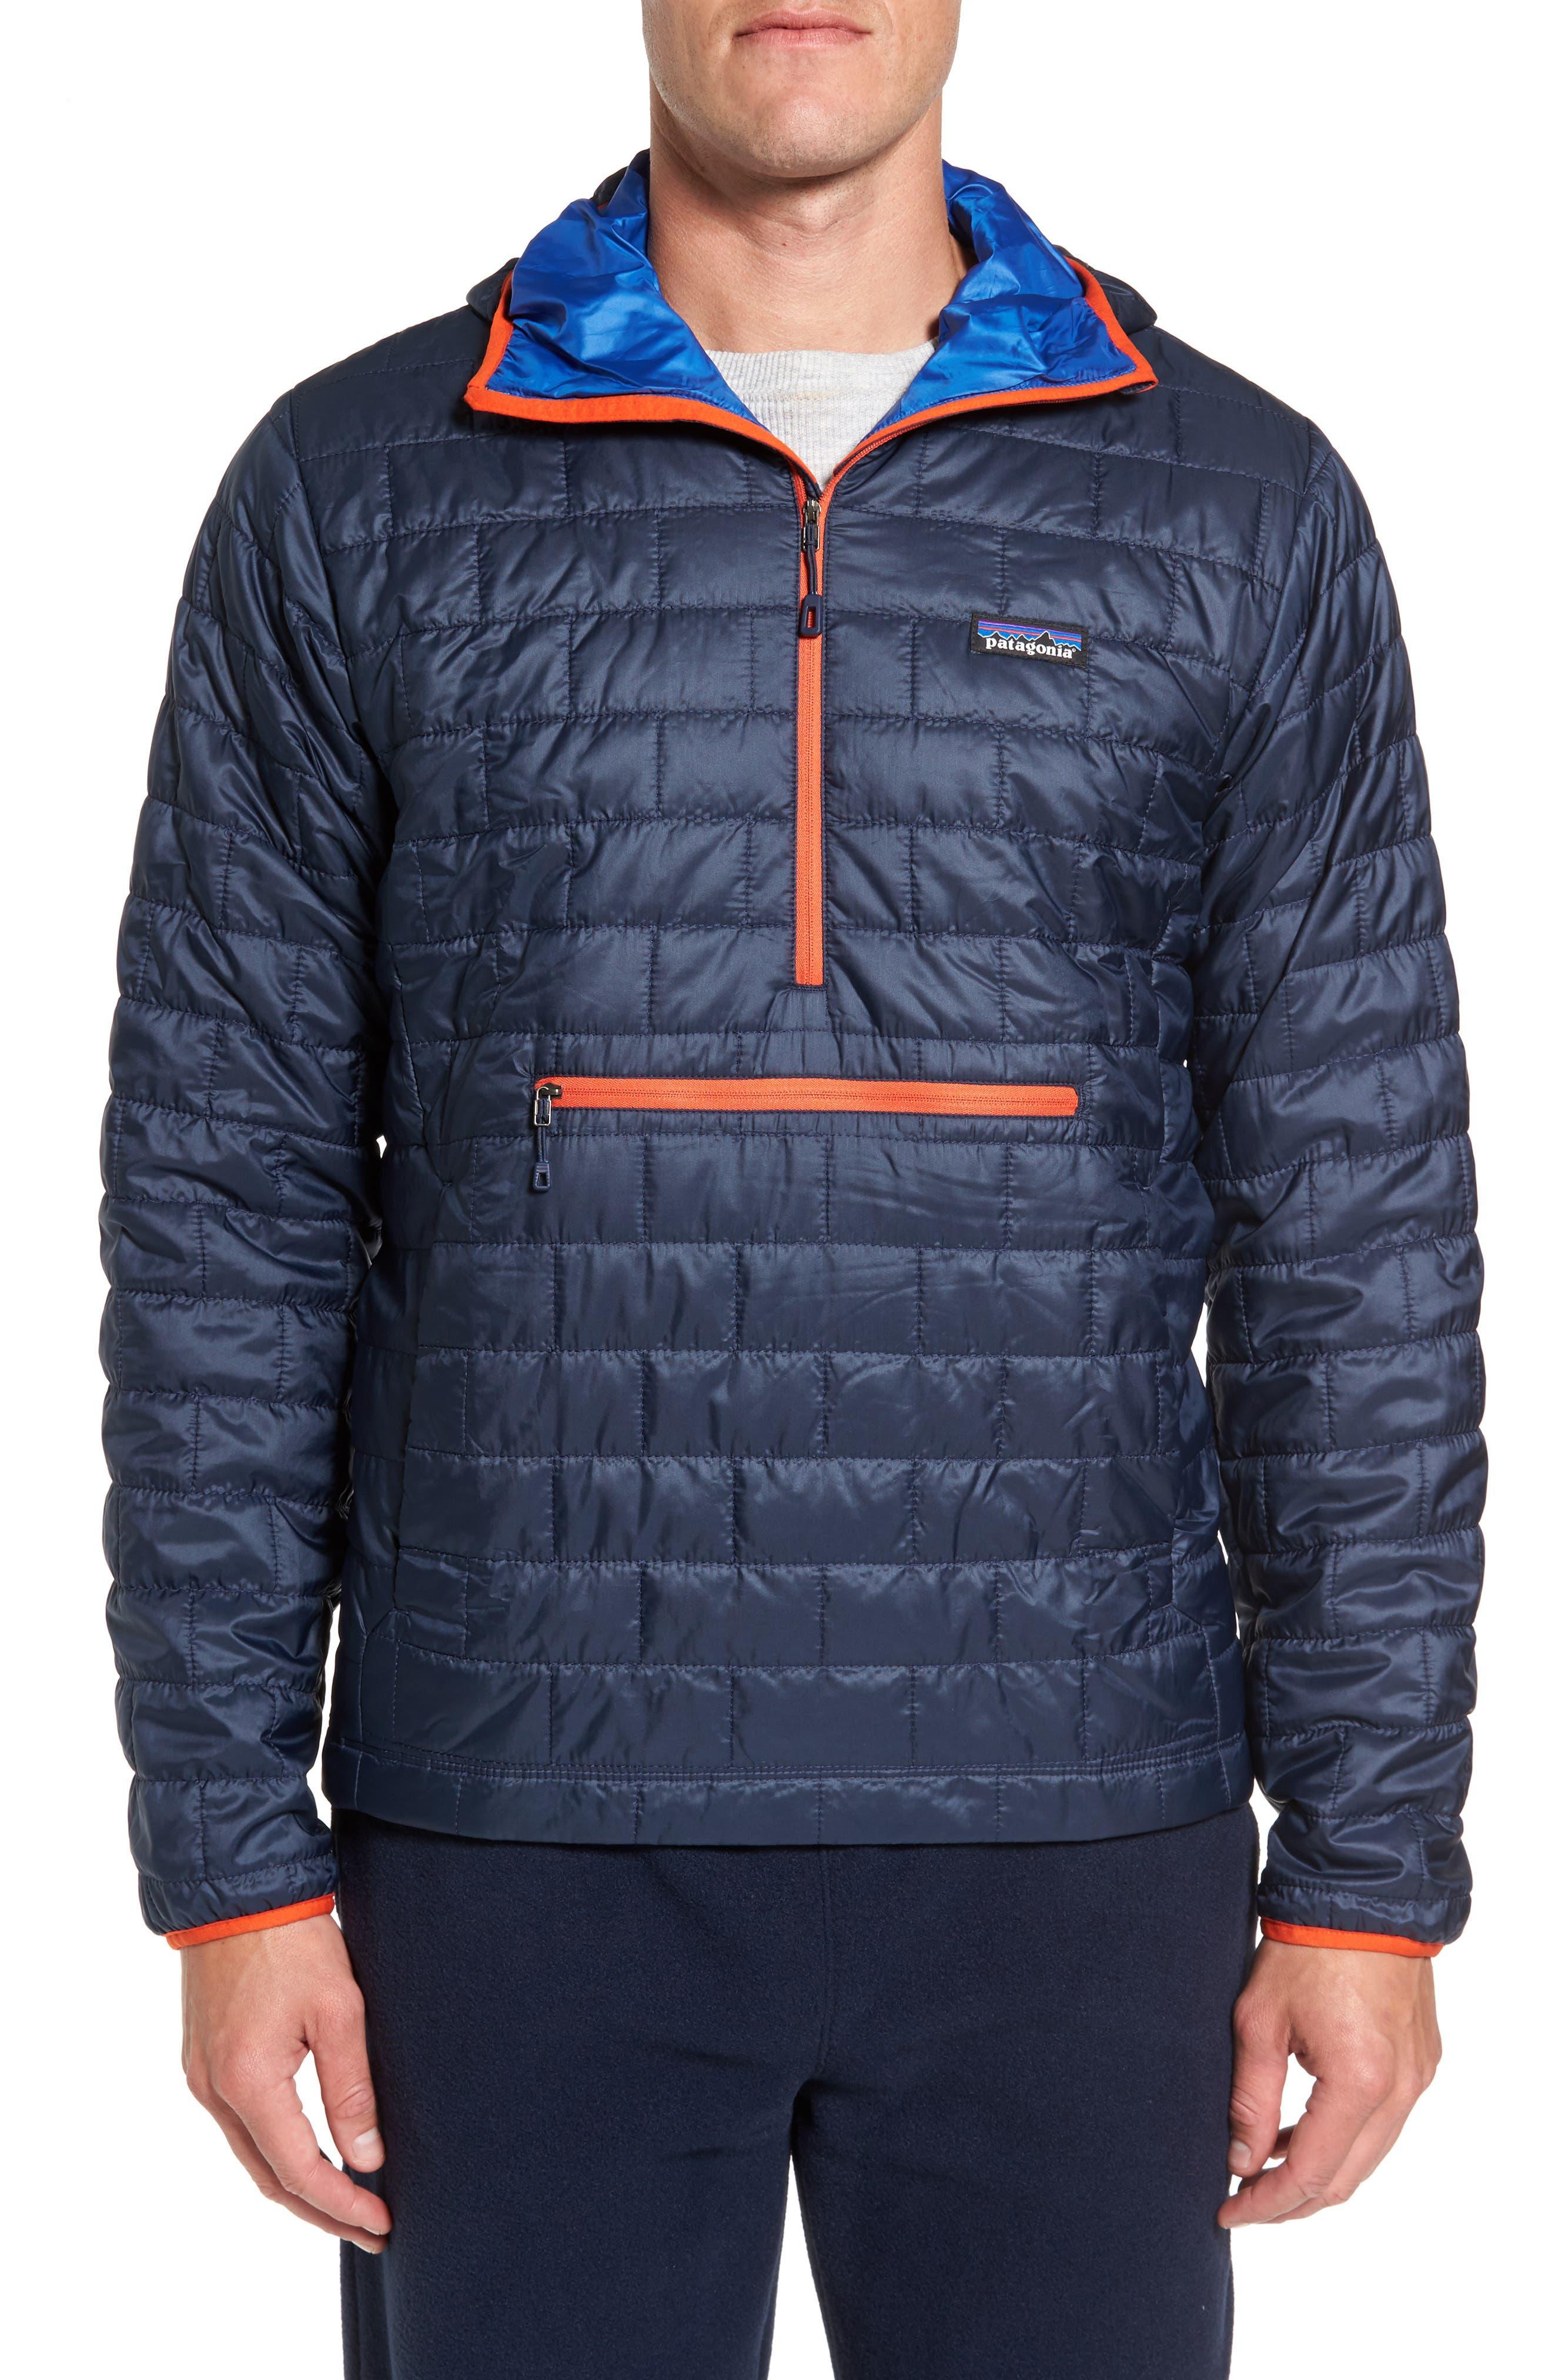 Patagonia Nano Puff® Bivy Regular Fit Water Resistant Jacket